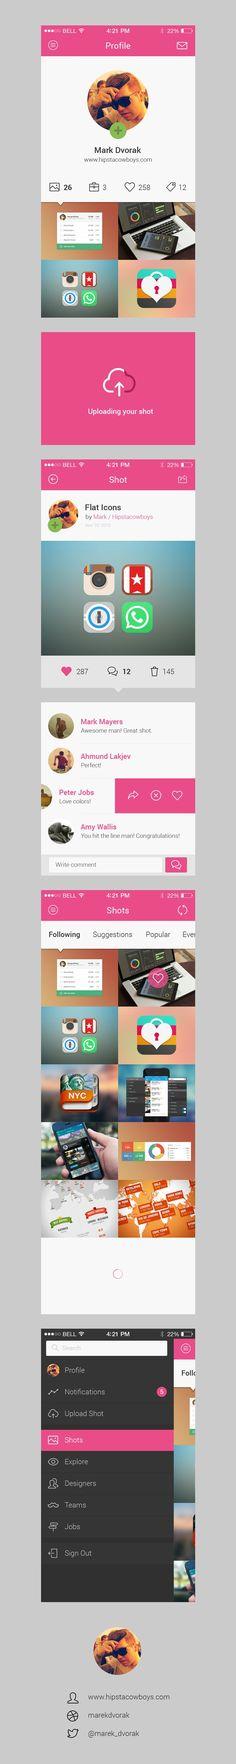 dribbbl app, mobil ui, free dribbbl, profil design, app concept